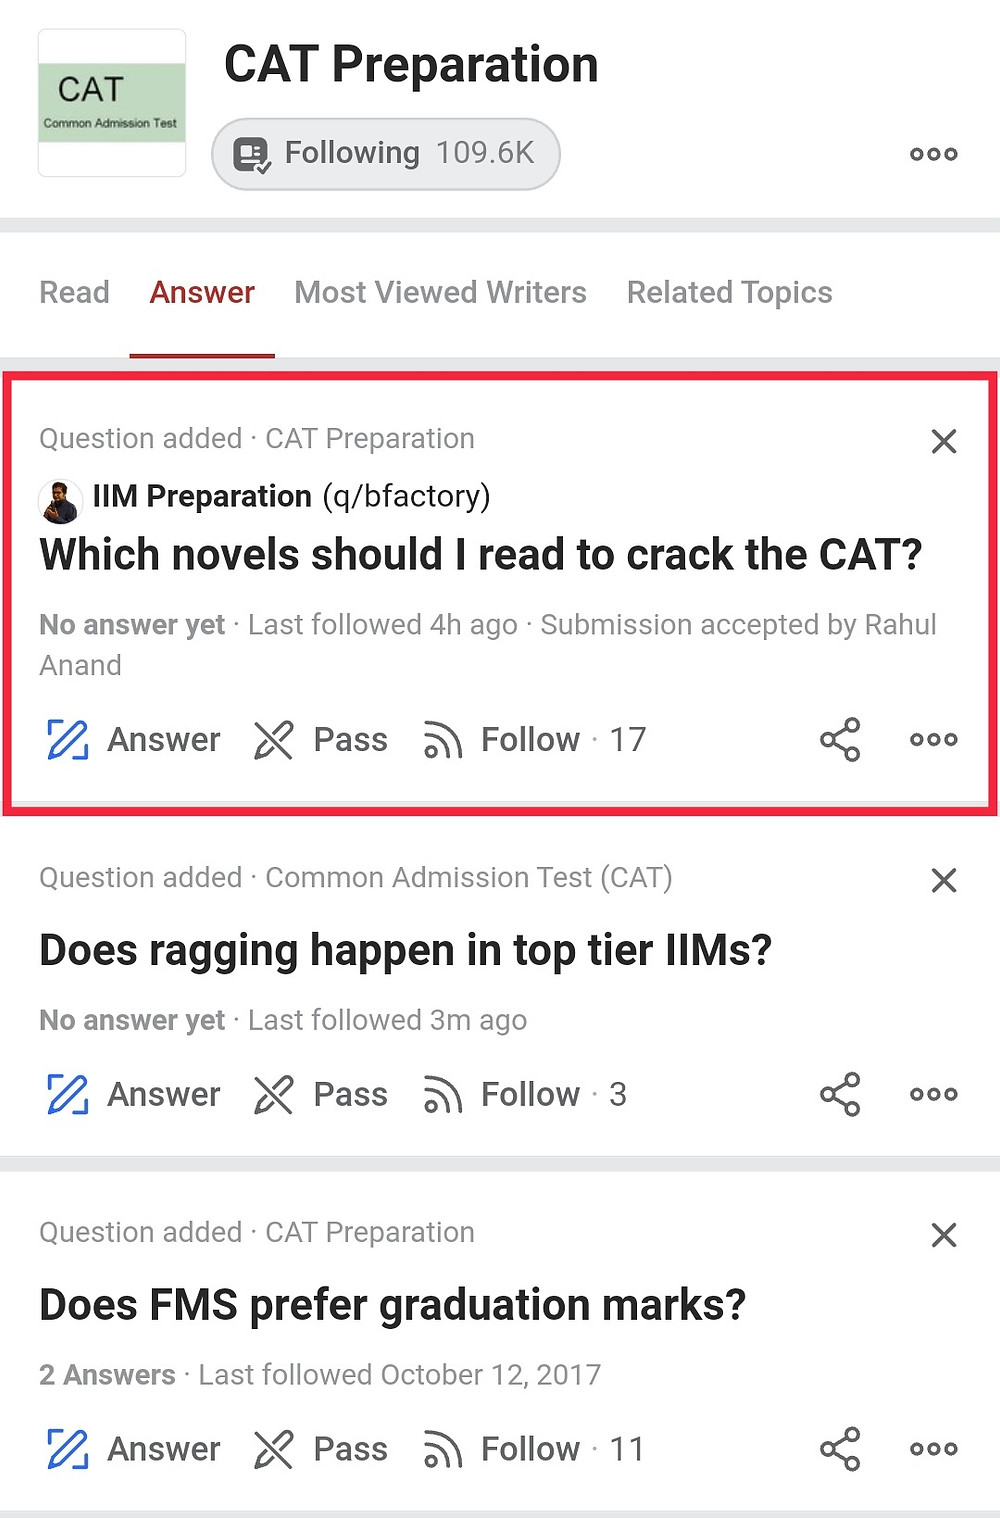 Generating Blog Topic